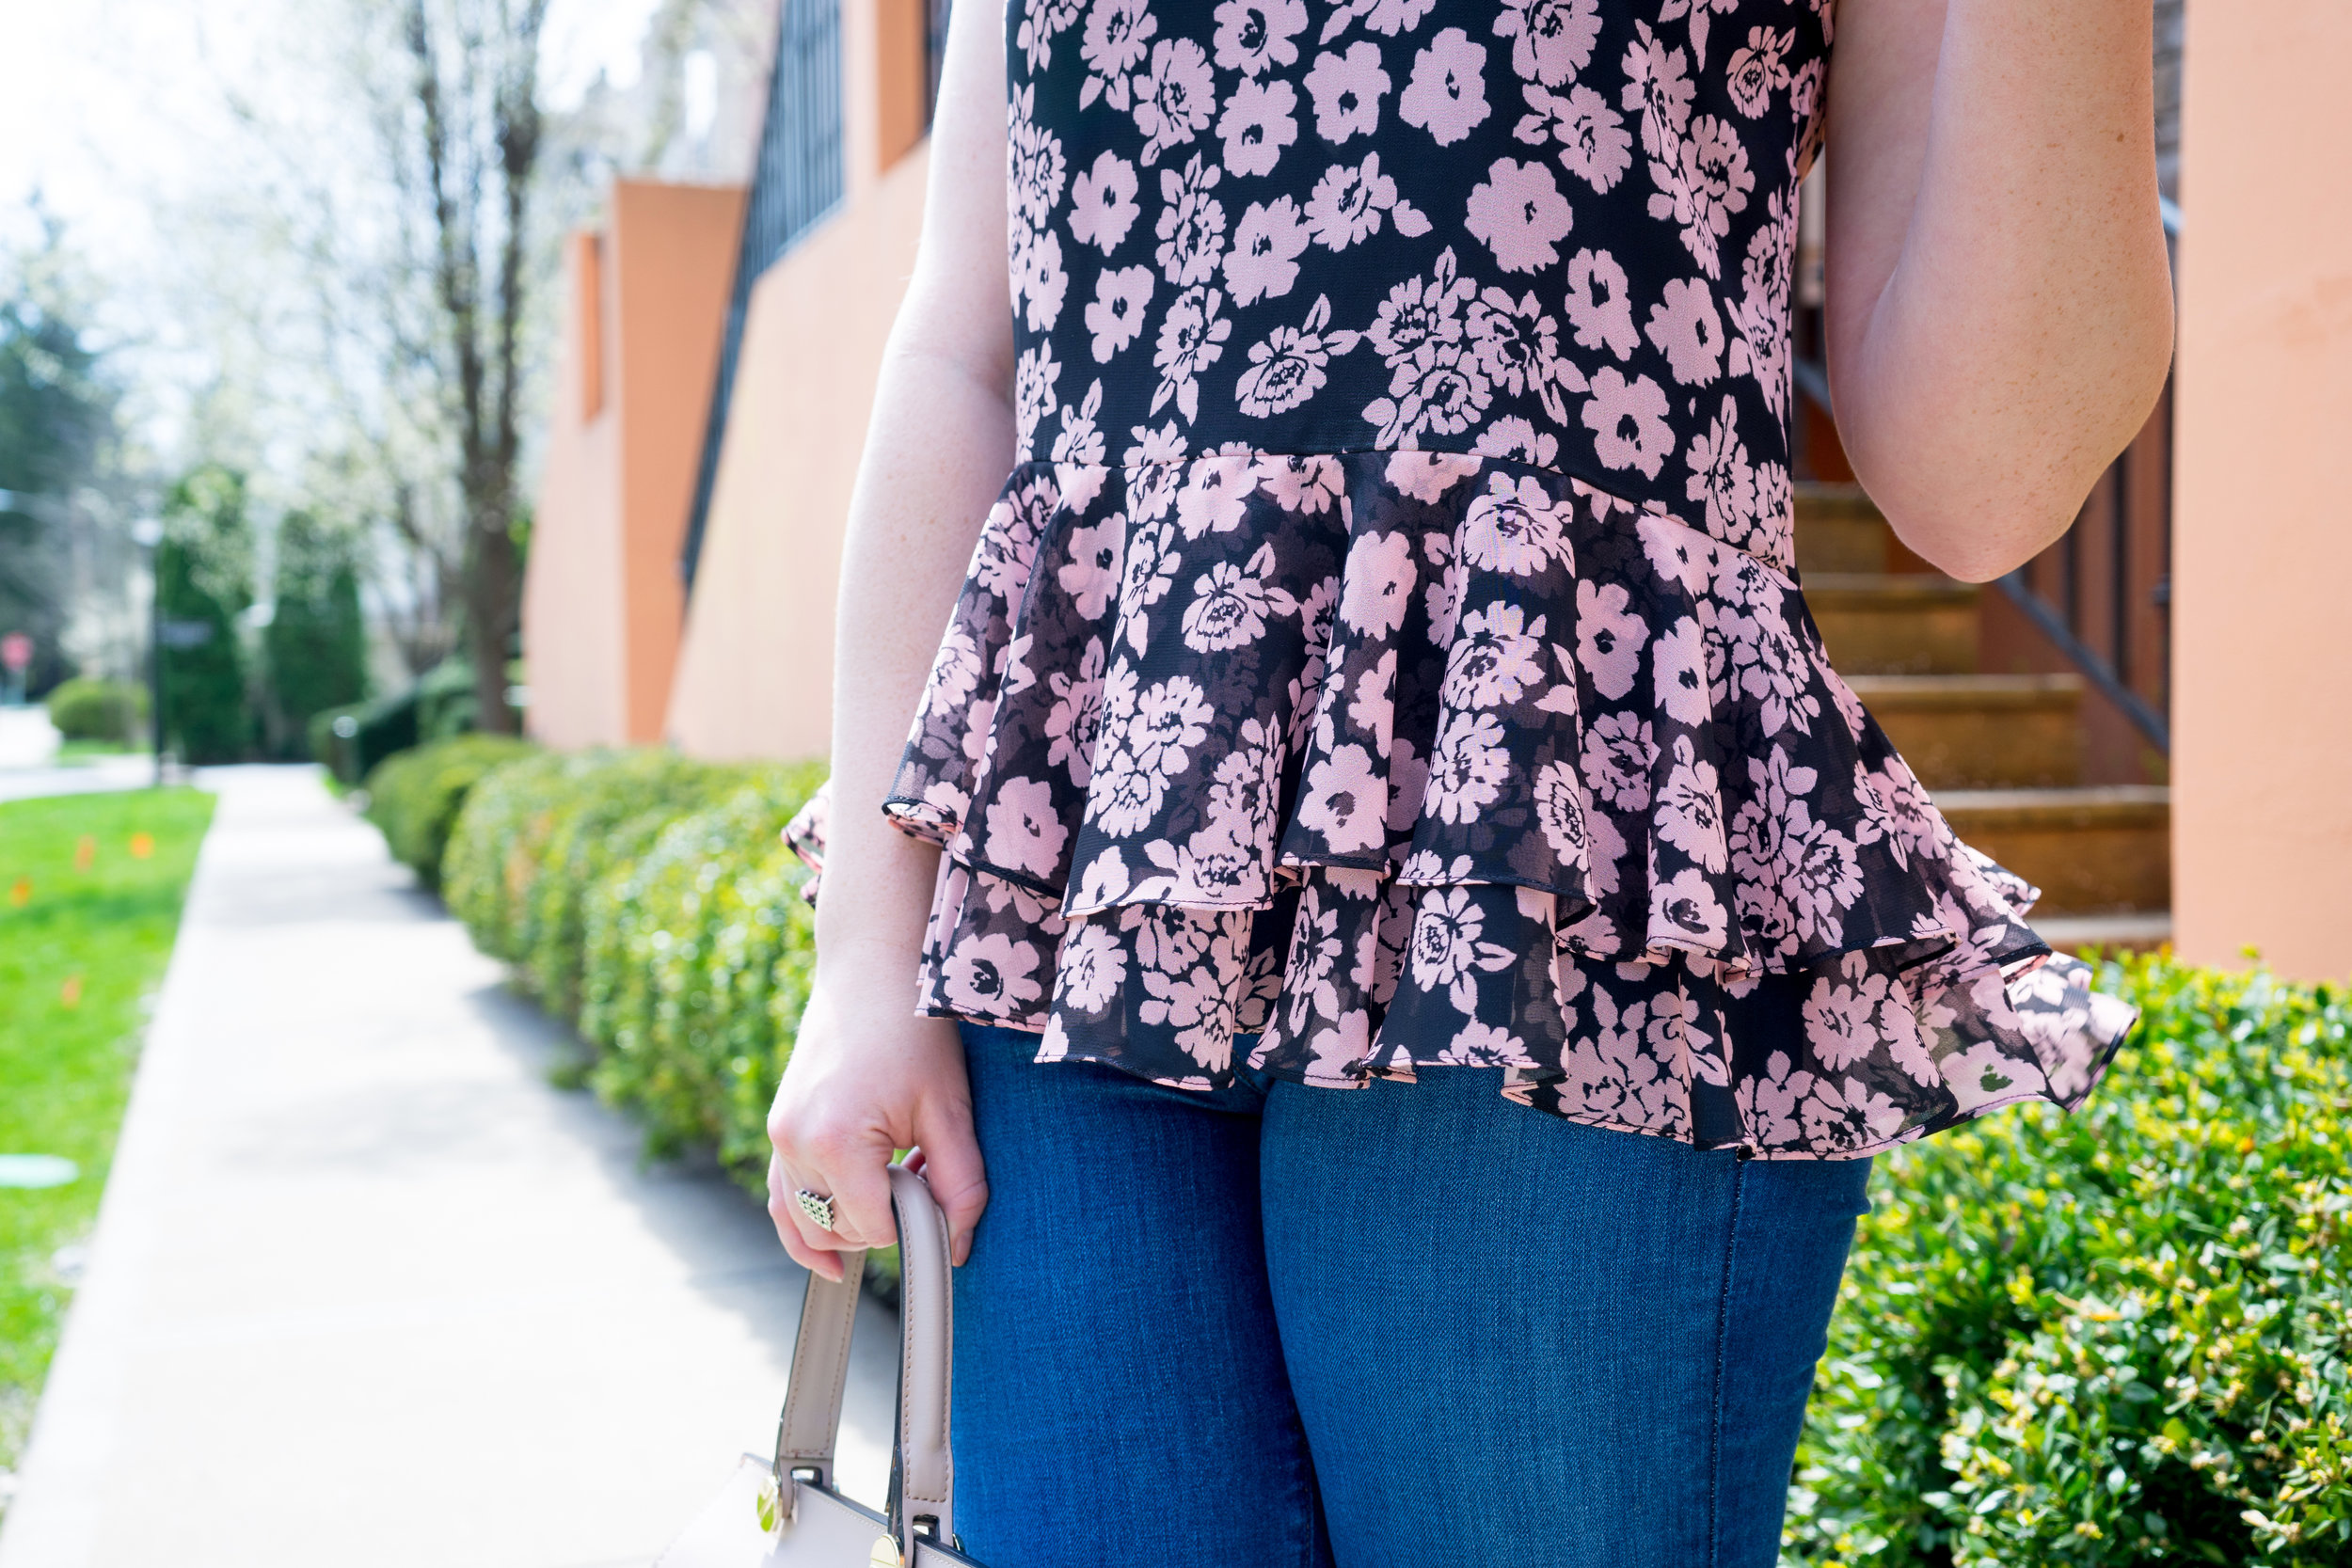 Maggie a la Mode - Milly Floral Print Flare Tank, Loft Flared Jeans, Steve Madden Carrson sandal, Camelia Roma Leather Handbag